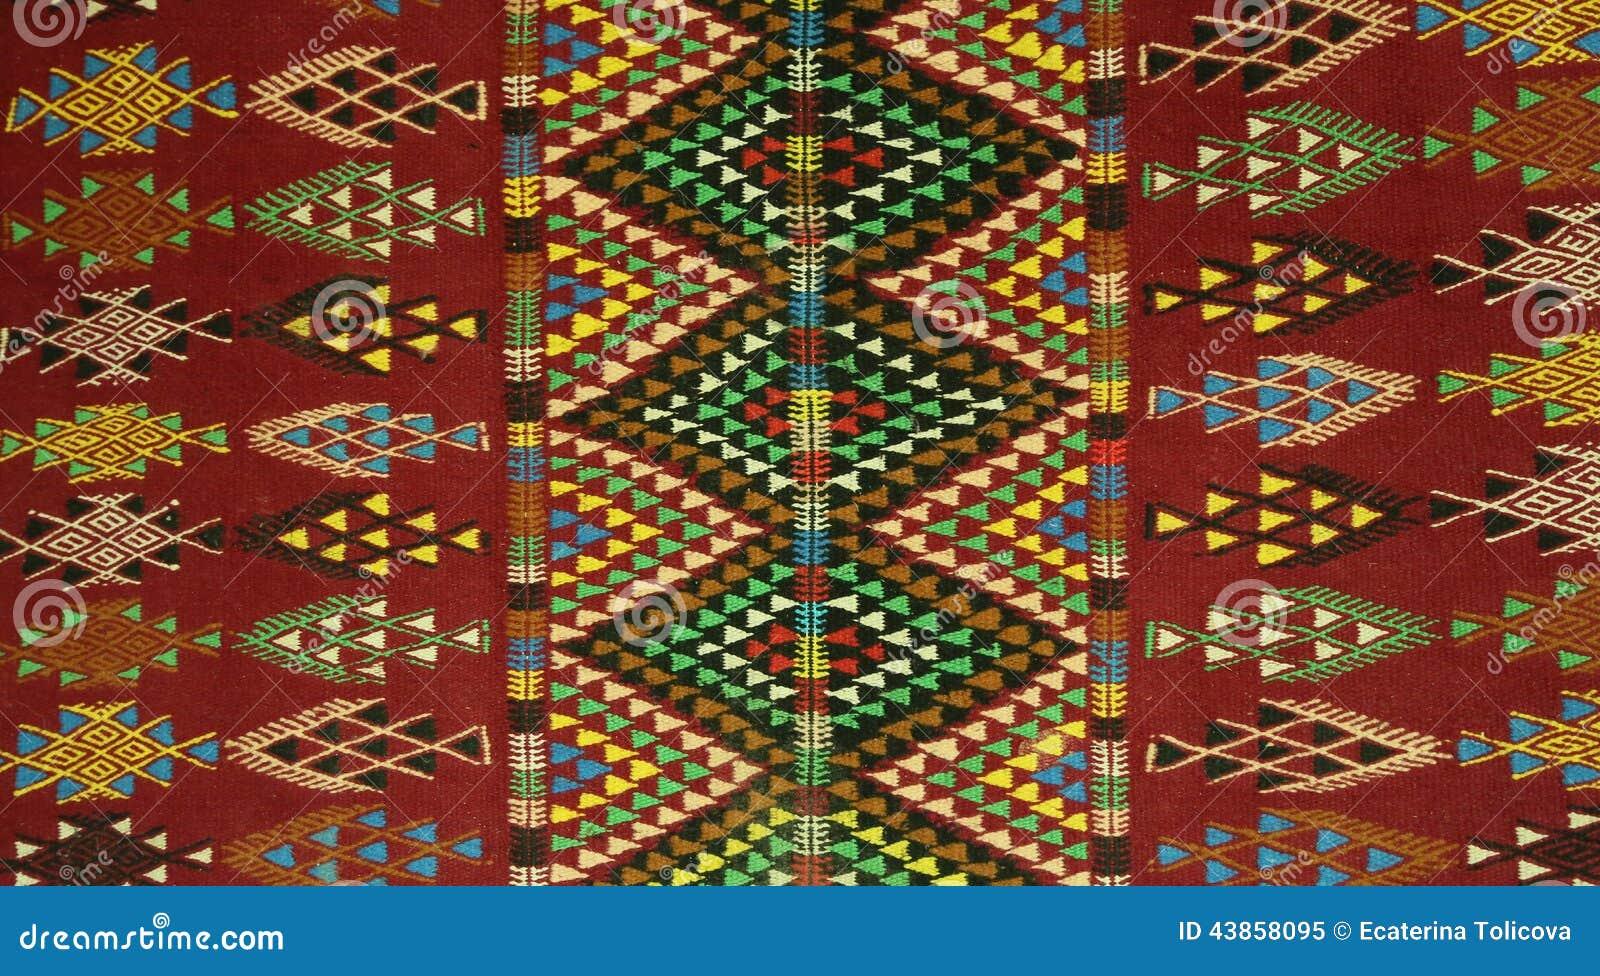 tunisian berbers 39 carpet style margoum stock image image of design yellow 43858095. Black Bedroom Furniture Sets. Home Design Ideas